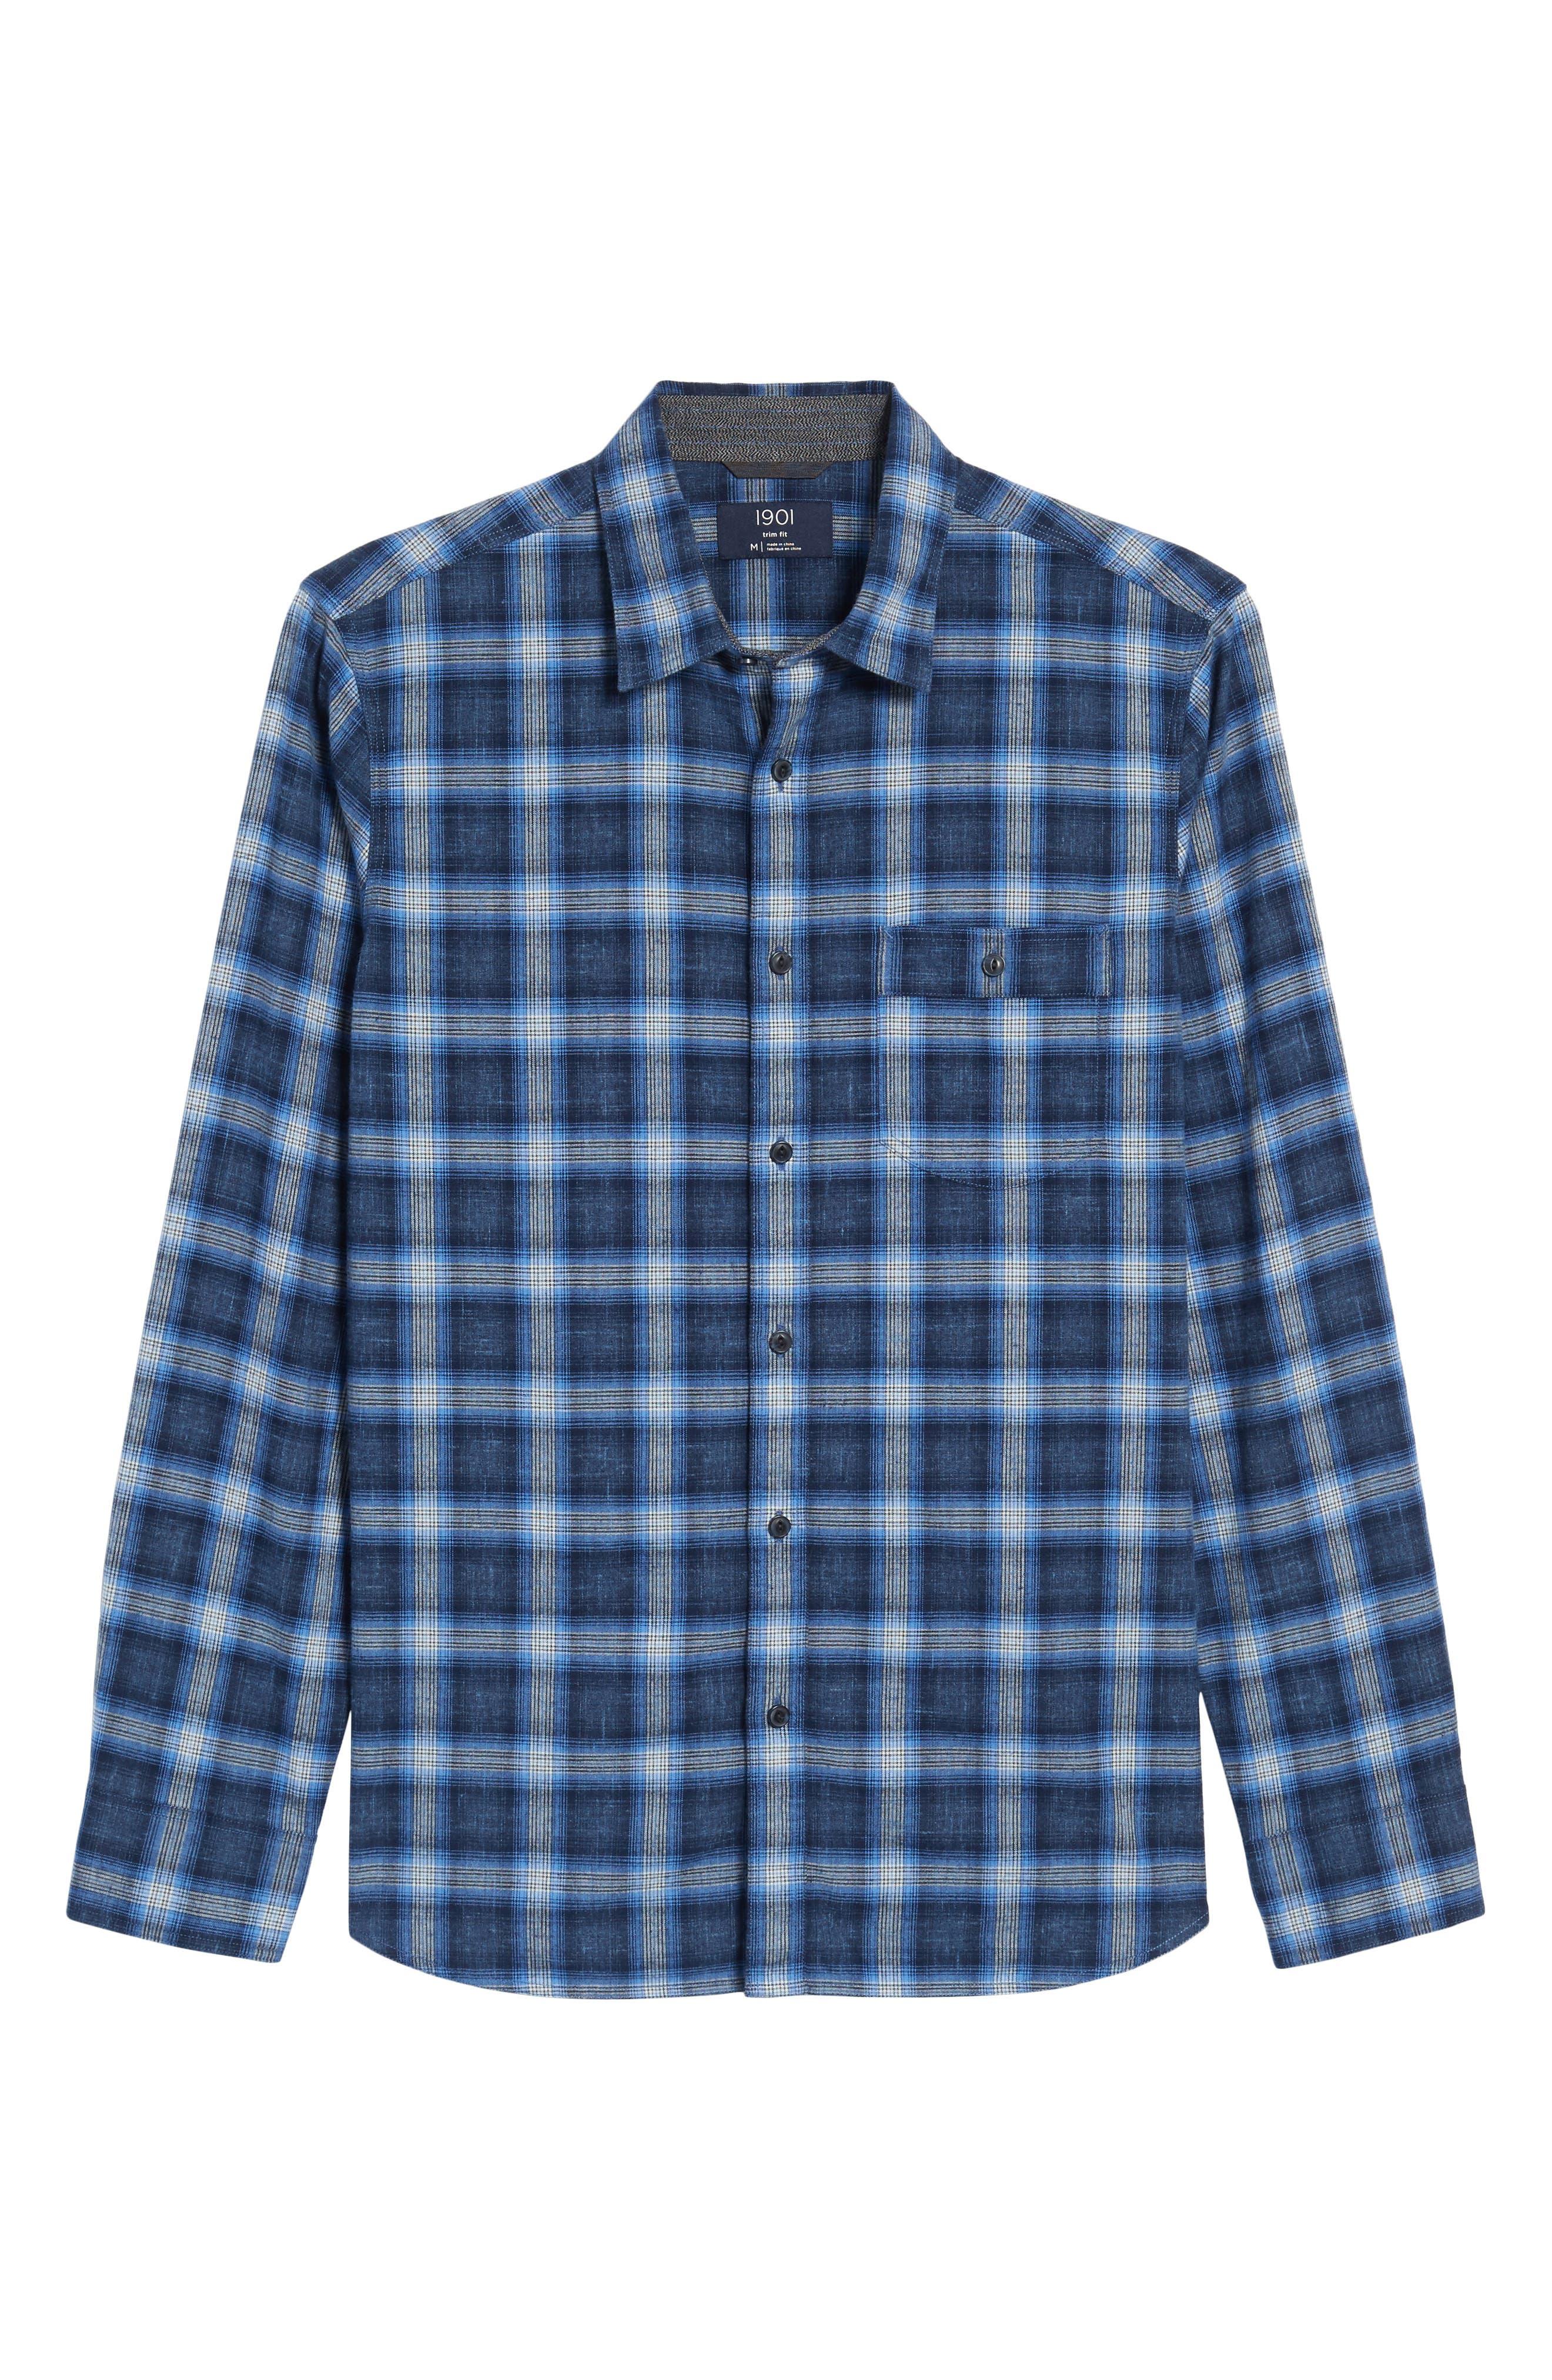 Trim Fit Plaid Sport Shirt,                             Alternate thumbnail 6, color,                             Black Blue Homespun Plaid